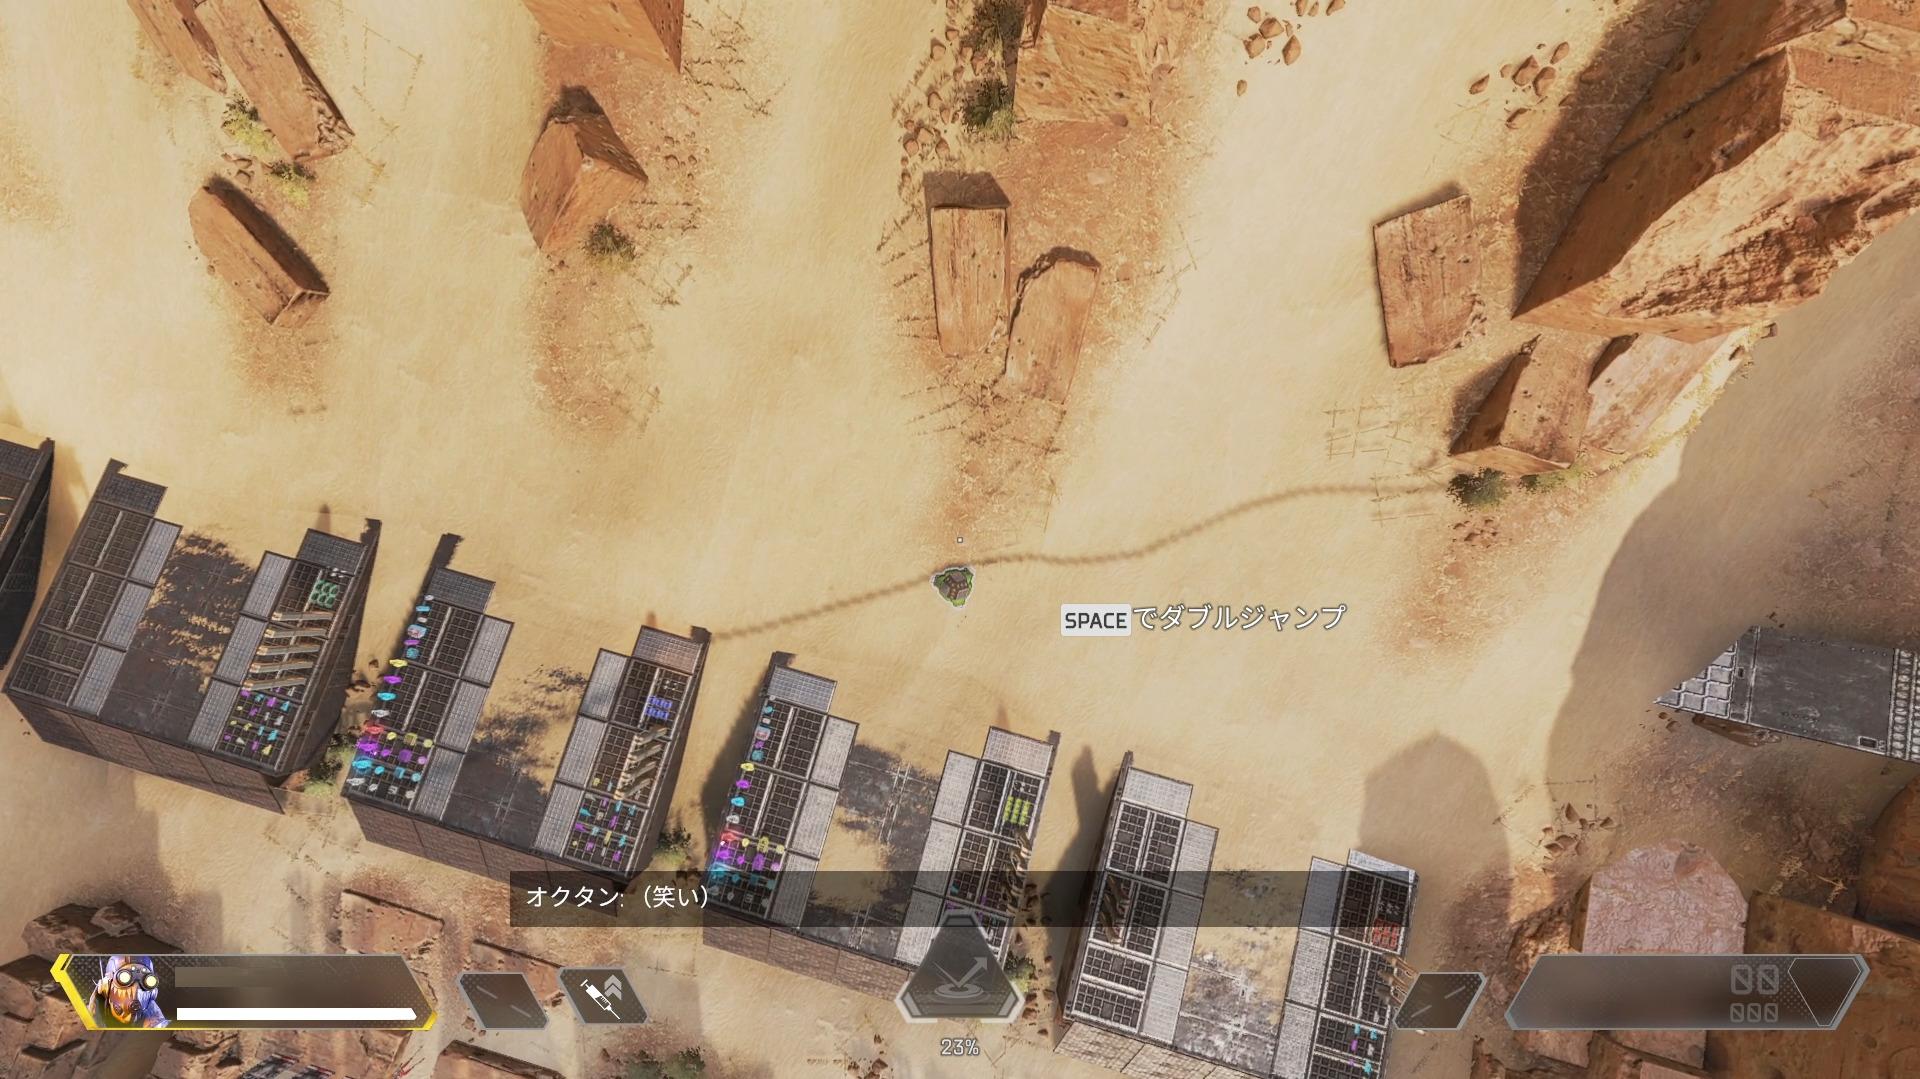 【Apex Legends】オクタンのジャンプパッドで垂直(真上)に飛ぶ方法【エーペックスレジェンズ】